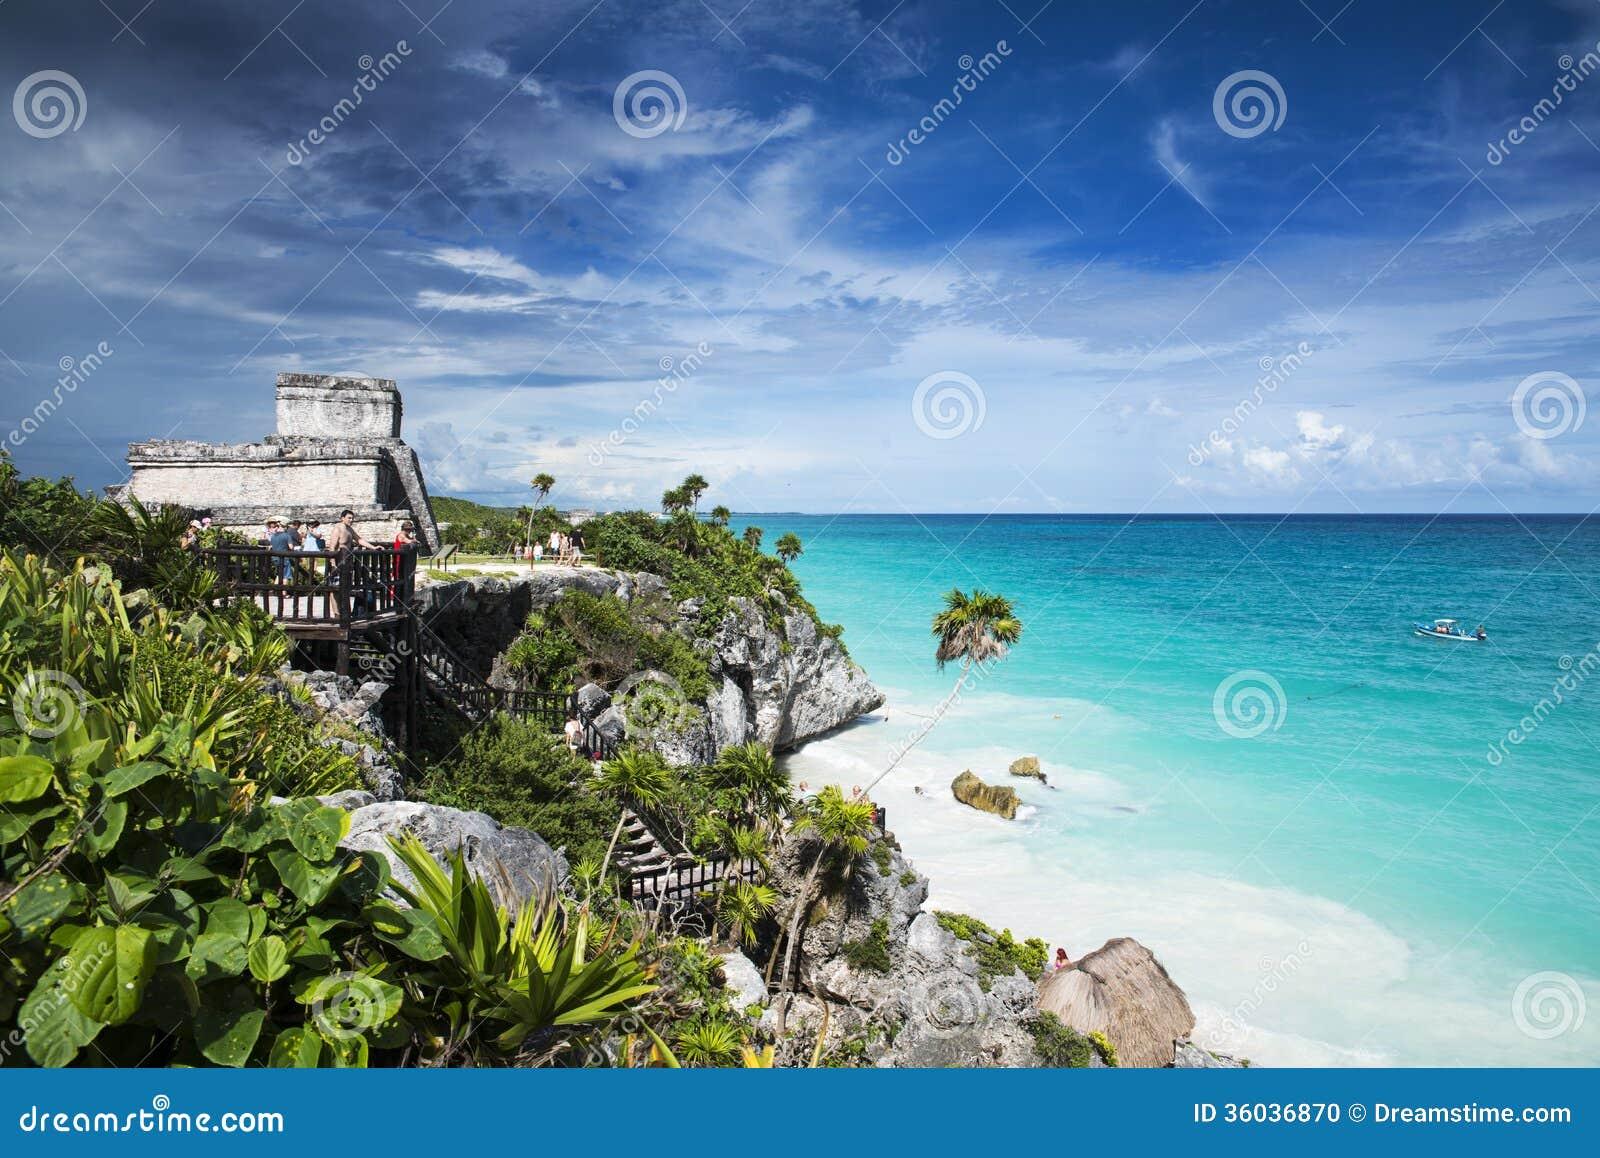 Riviera Maya Ruins Beach Palms